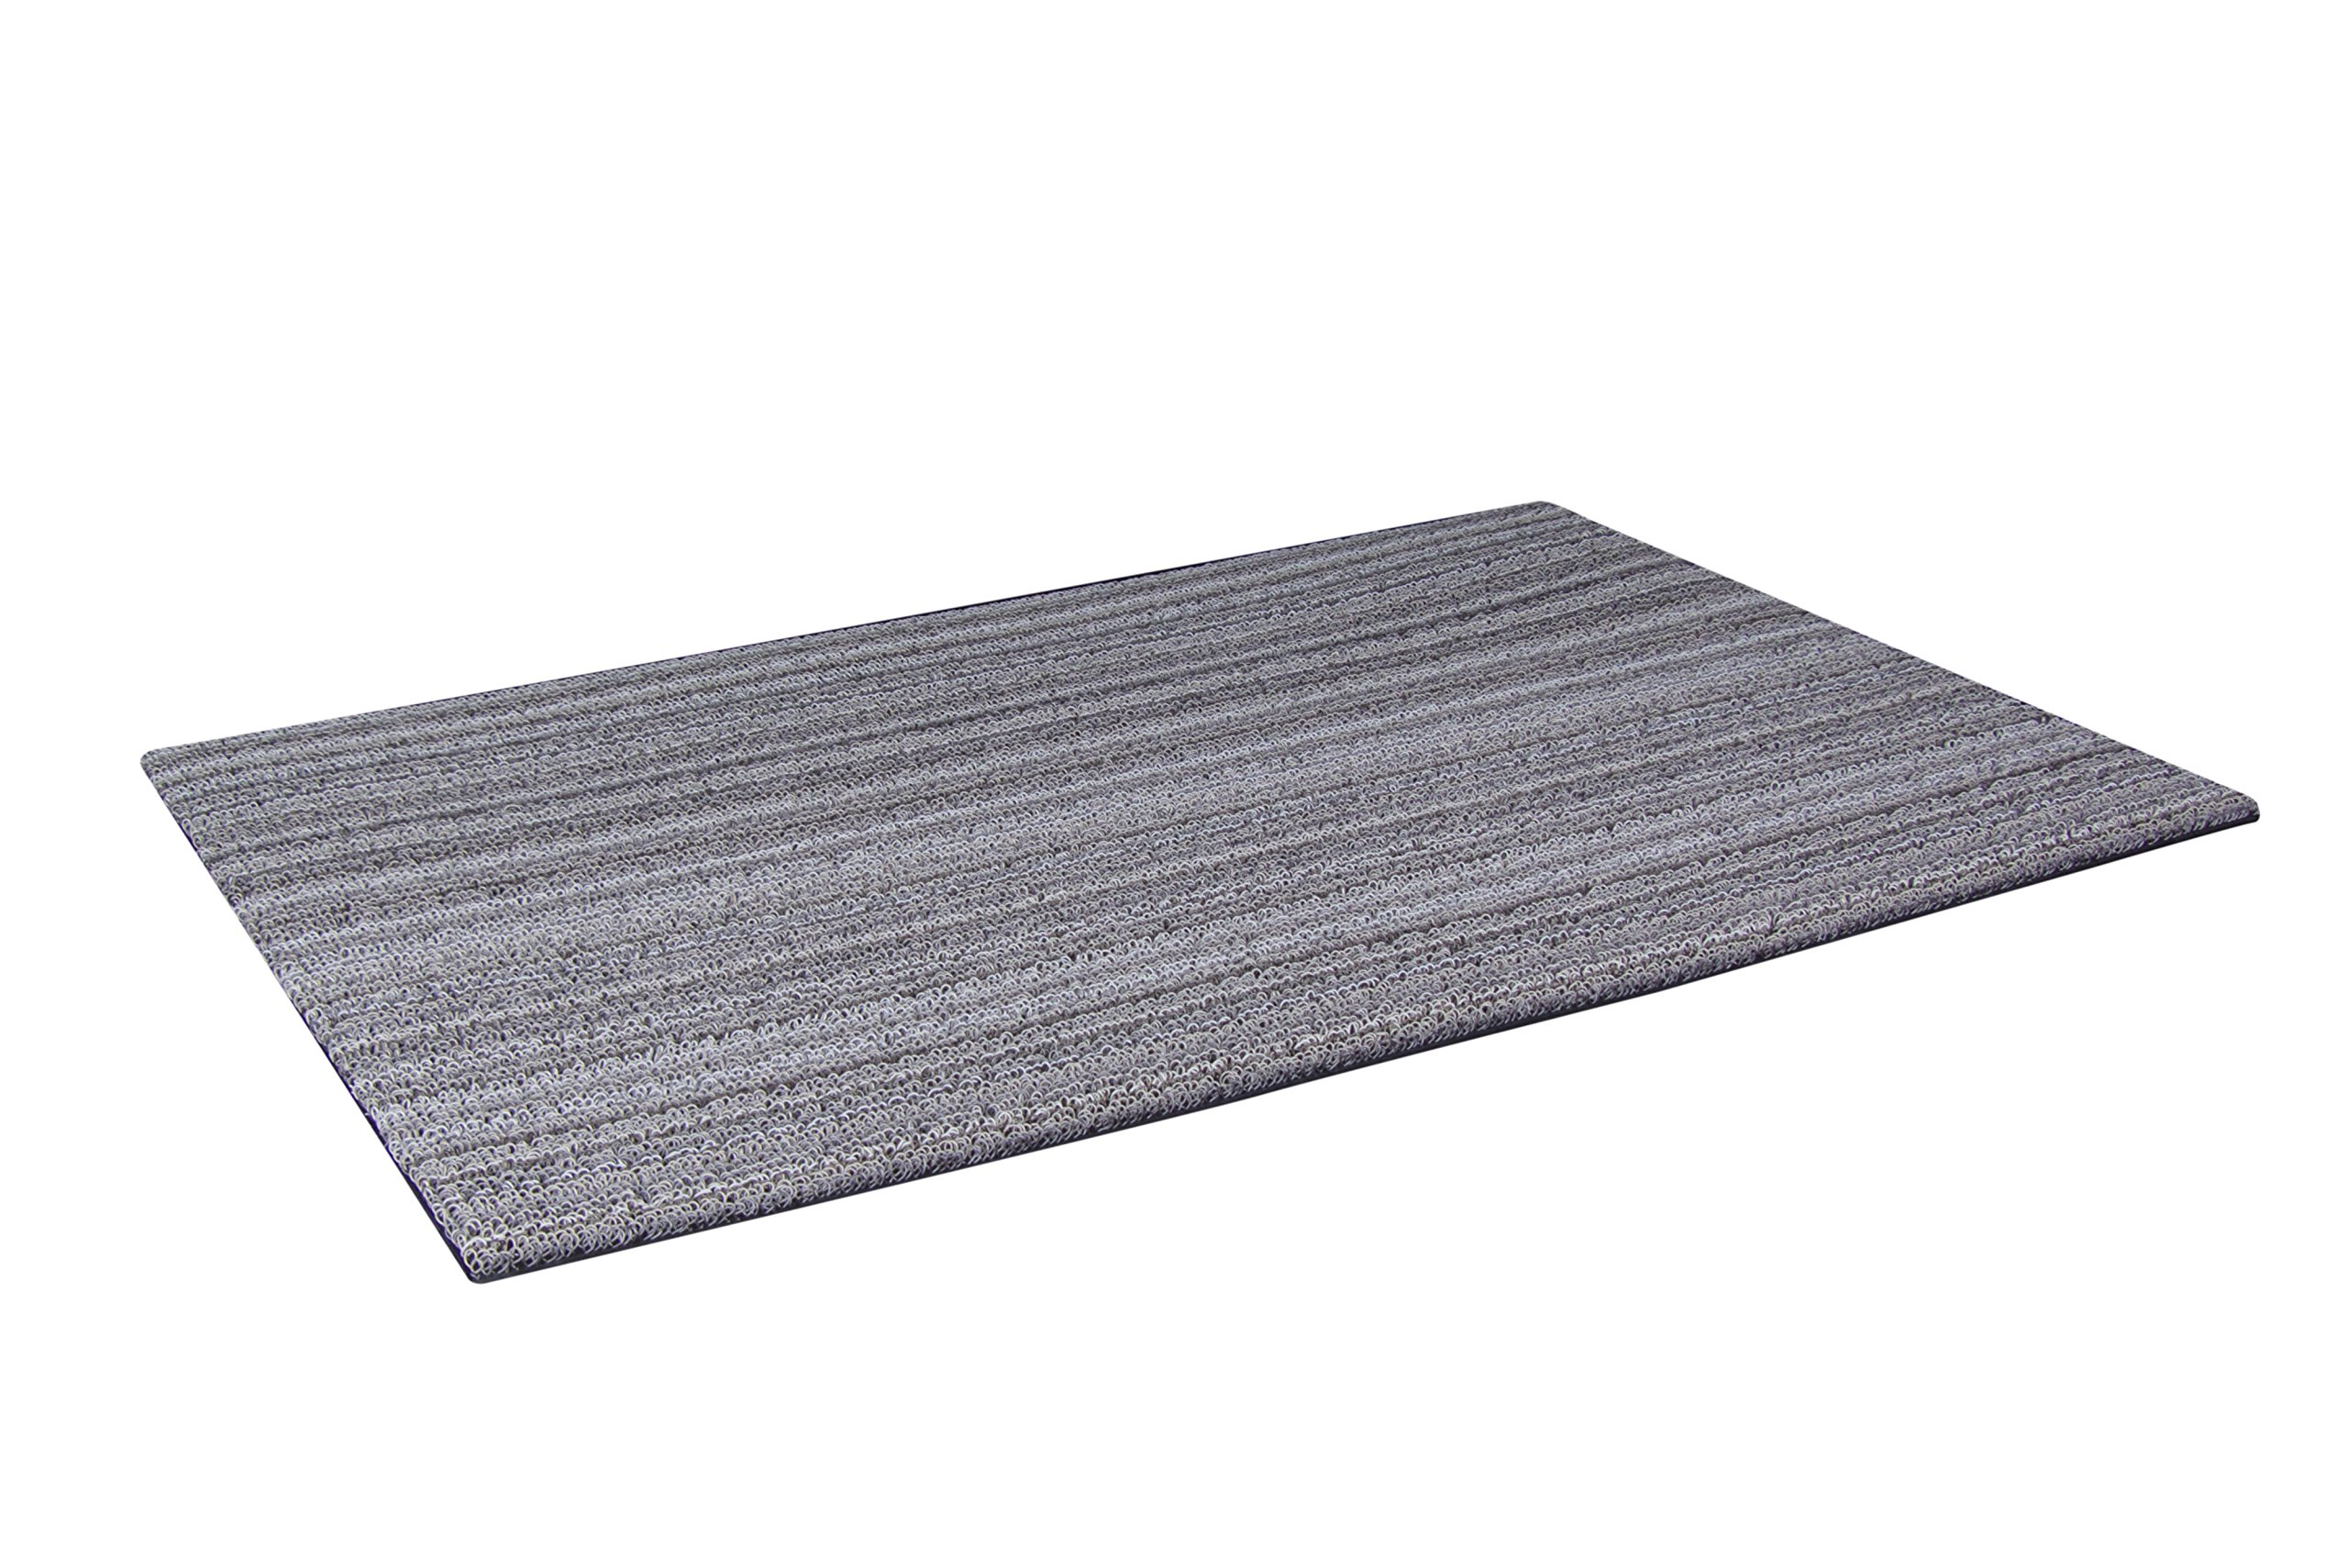 Chilewich Skinny Stripe Doormat, 18 by 28-Inch, Birch by Chilewich (Image #2)